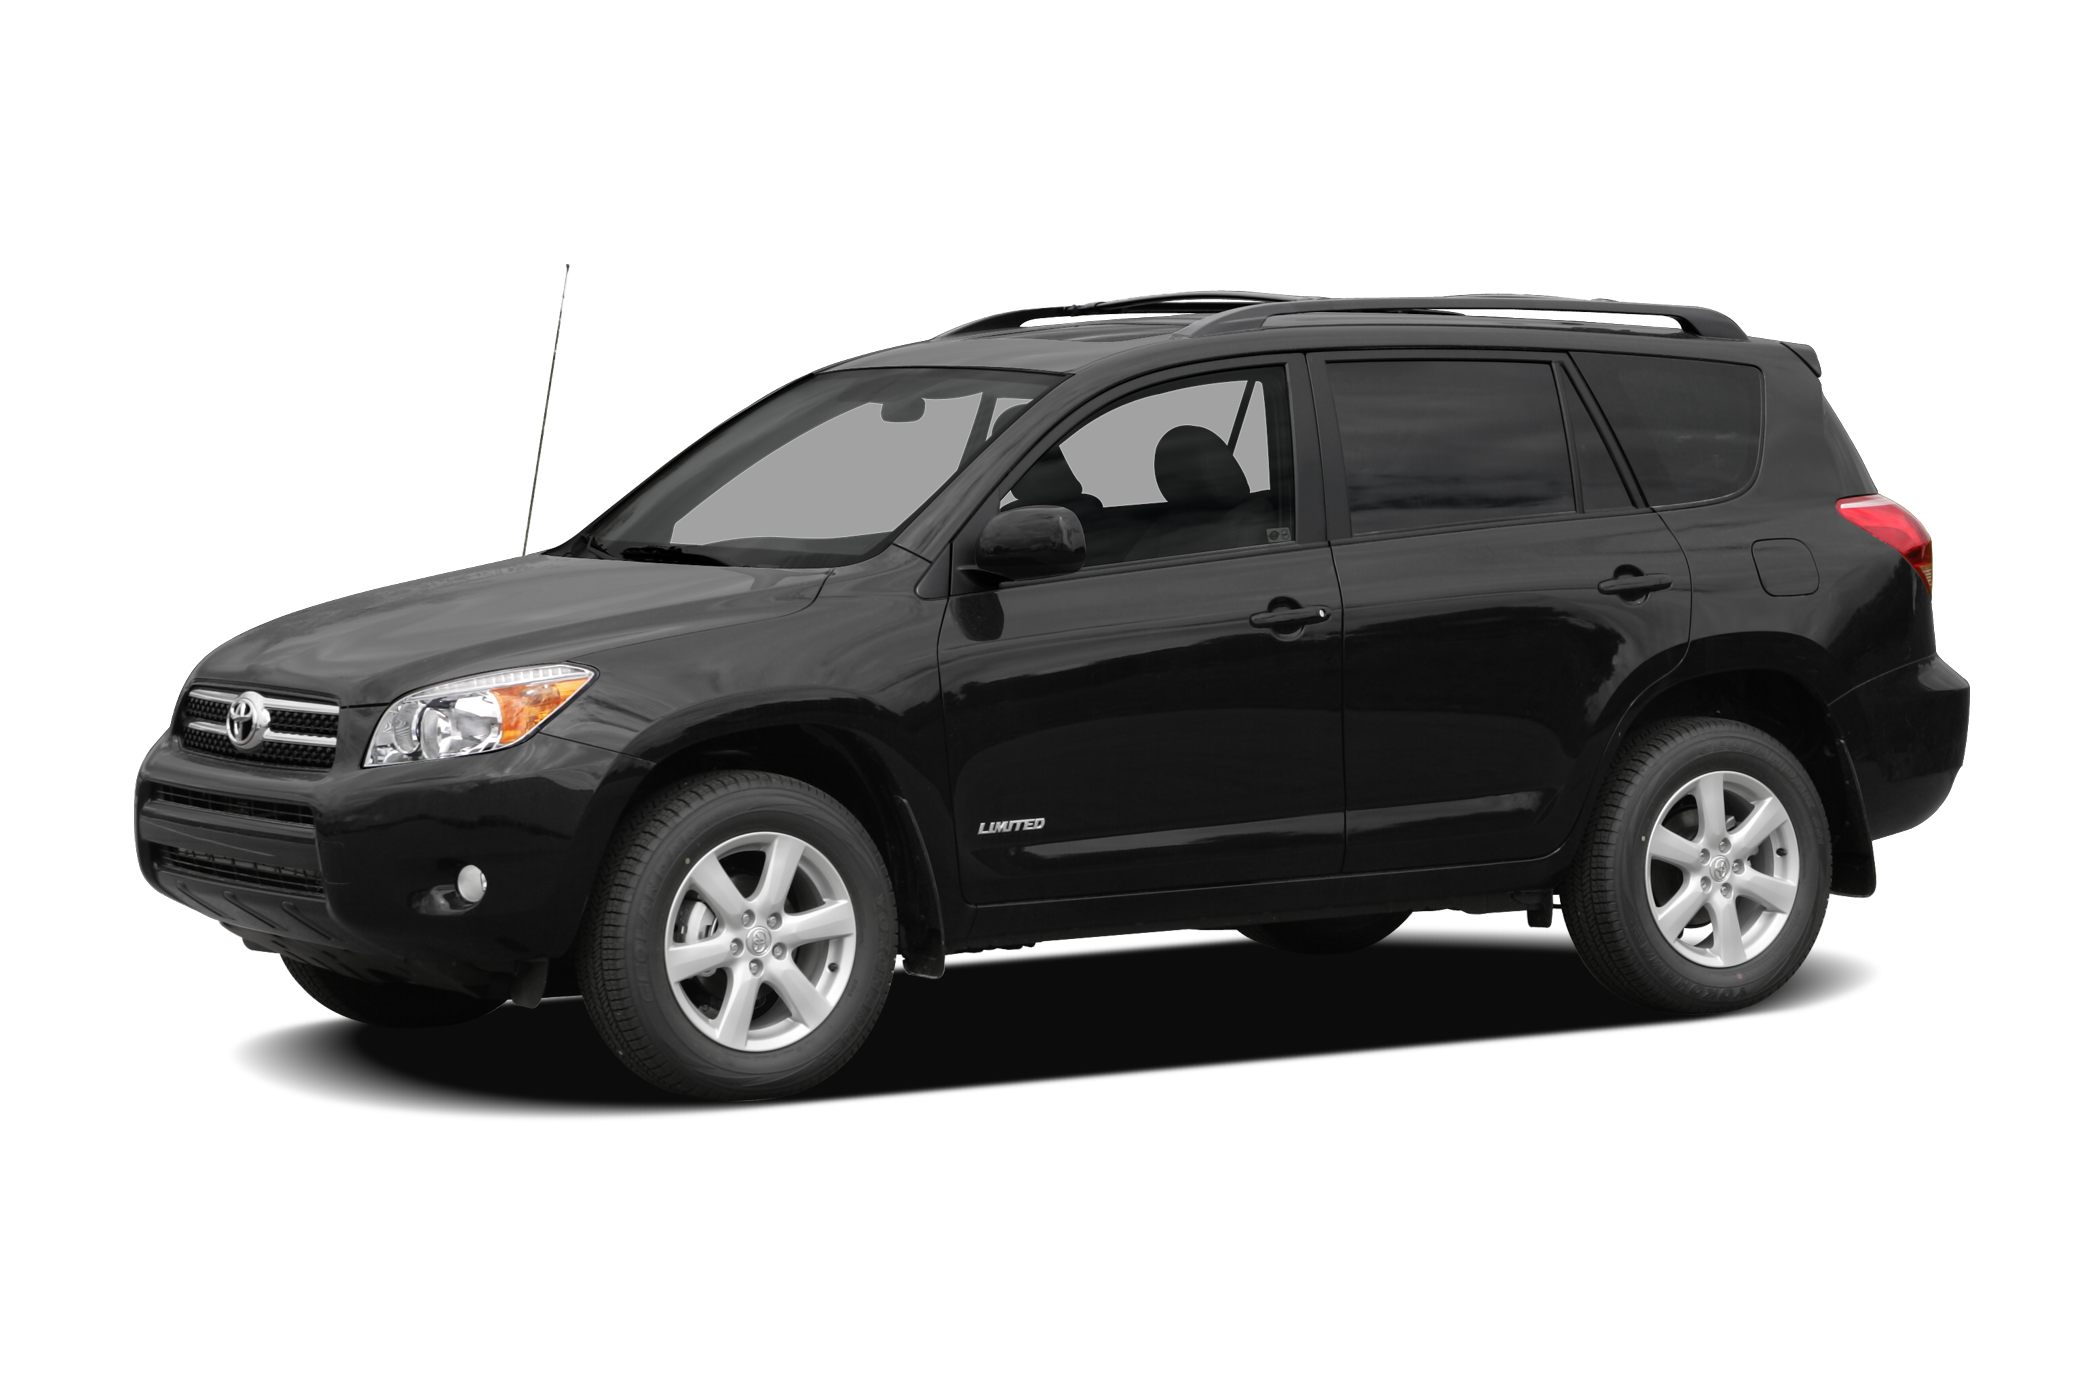 2008 mercury mariner reviews autoblog and new car test drive. Black Bedroom Furniture Sets. Home Design Ideas